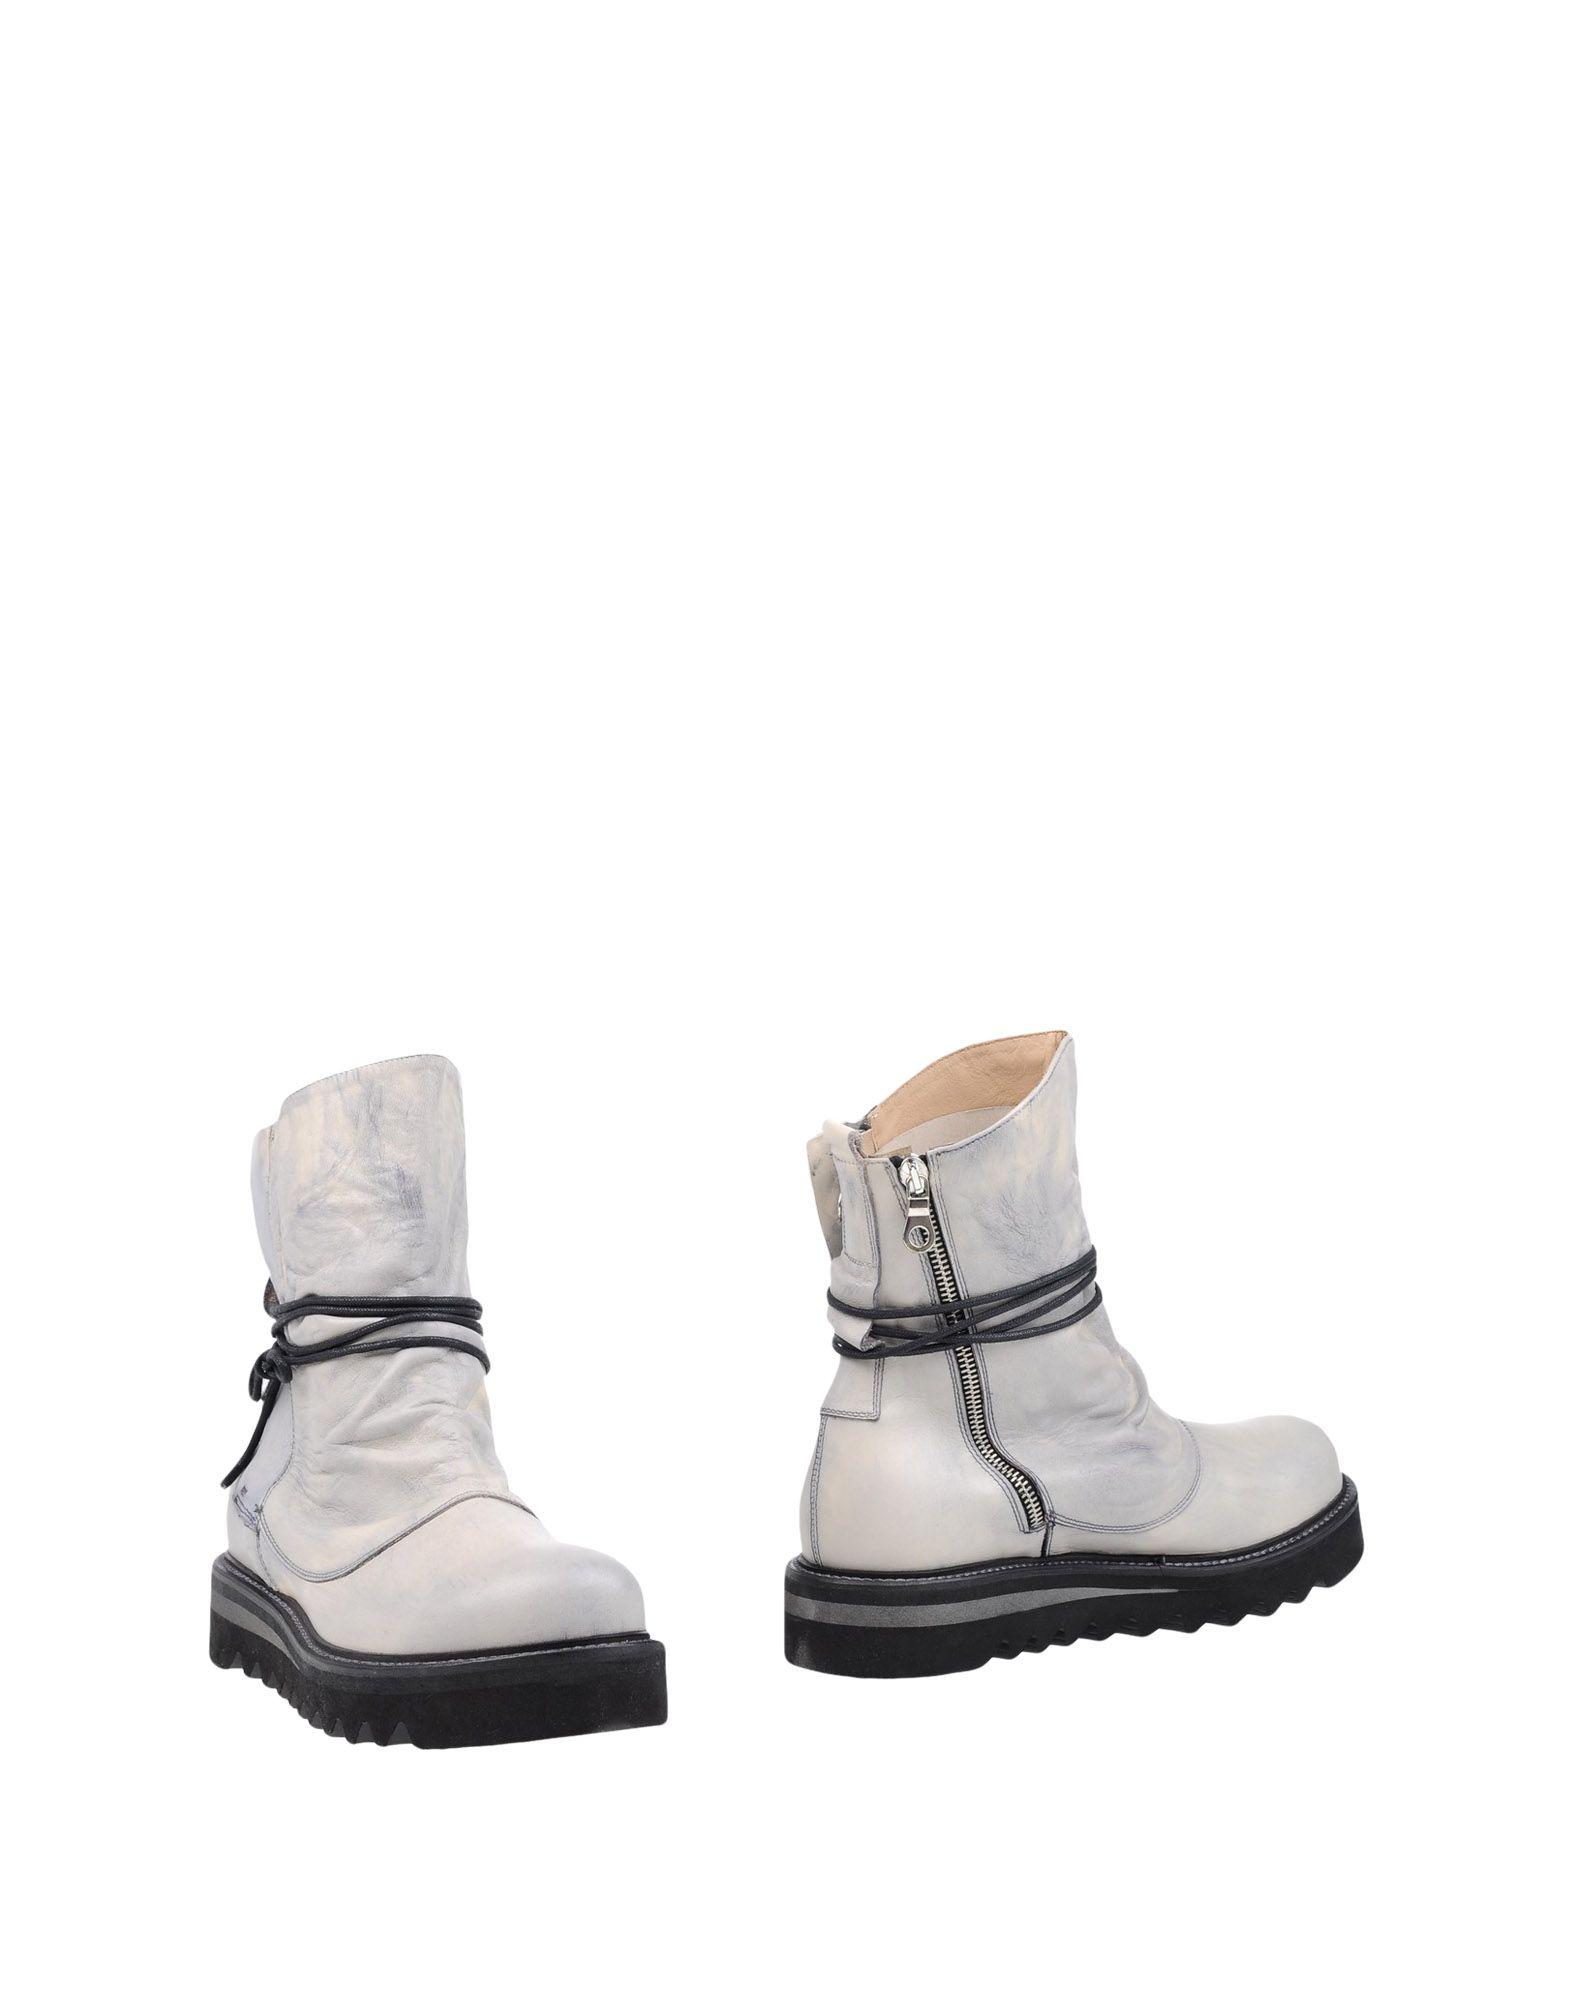 Stilvolle billige Schuhe Marcel Martillo Stiefelette Damen  11368097OT